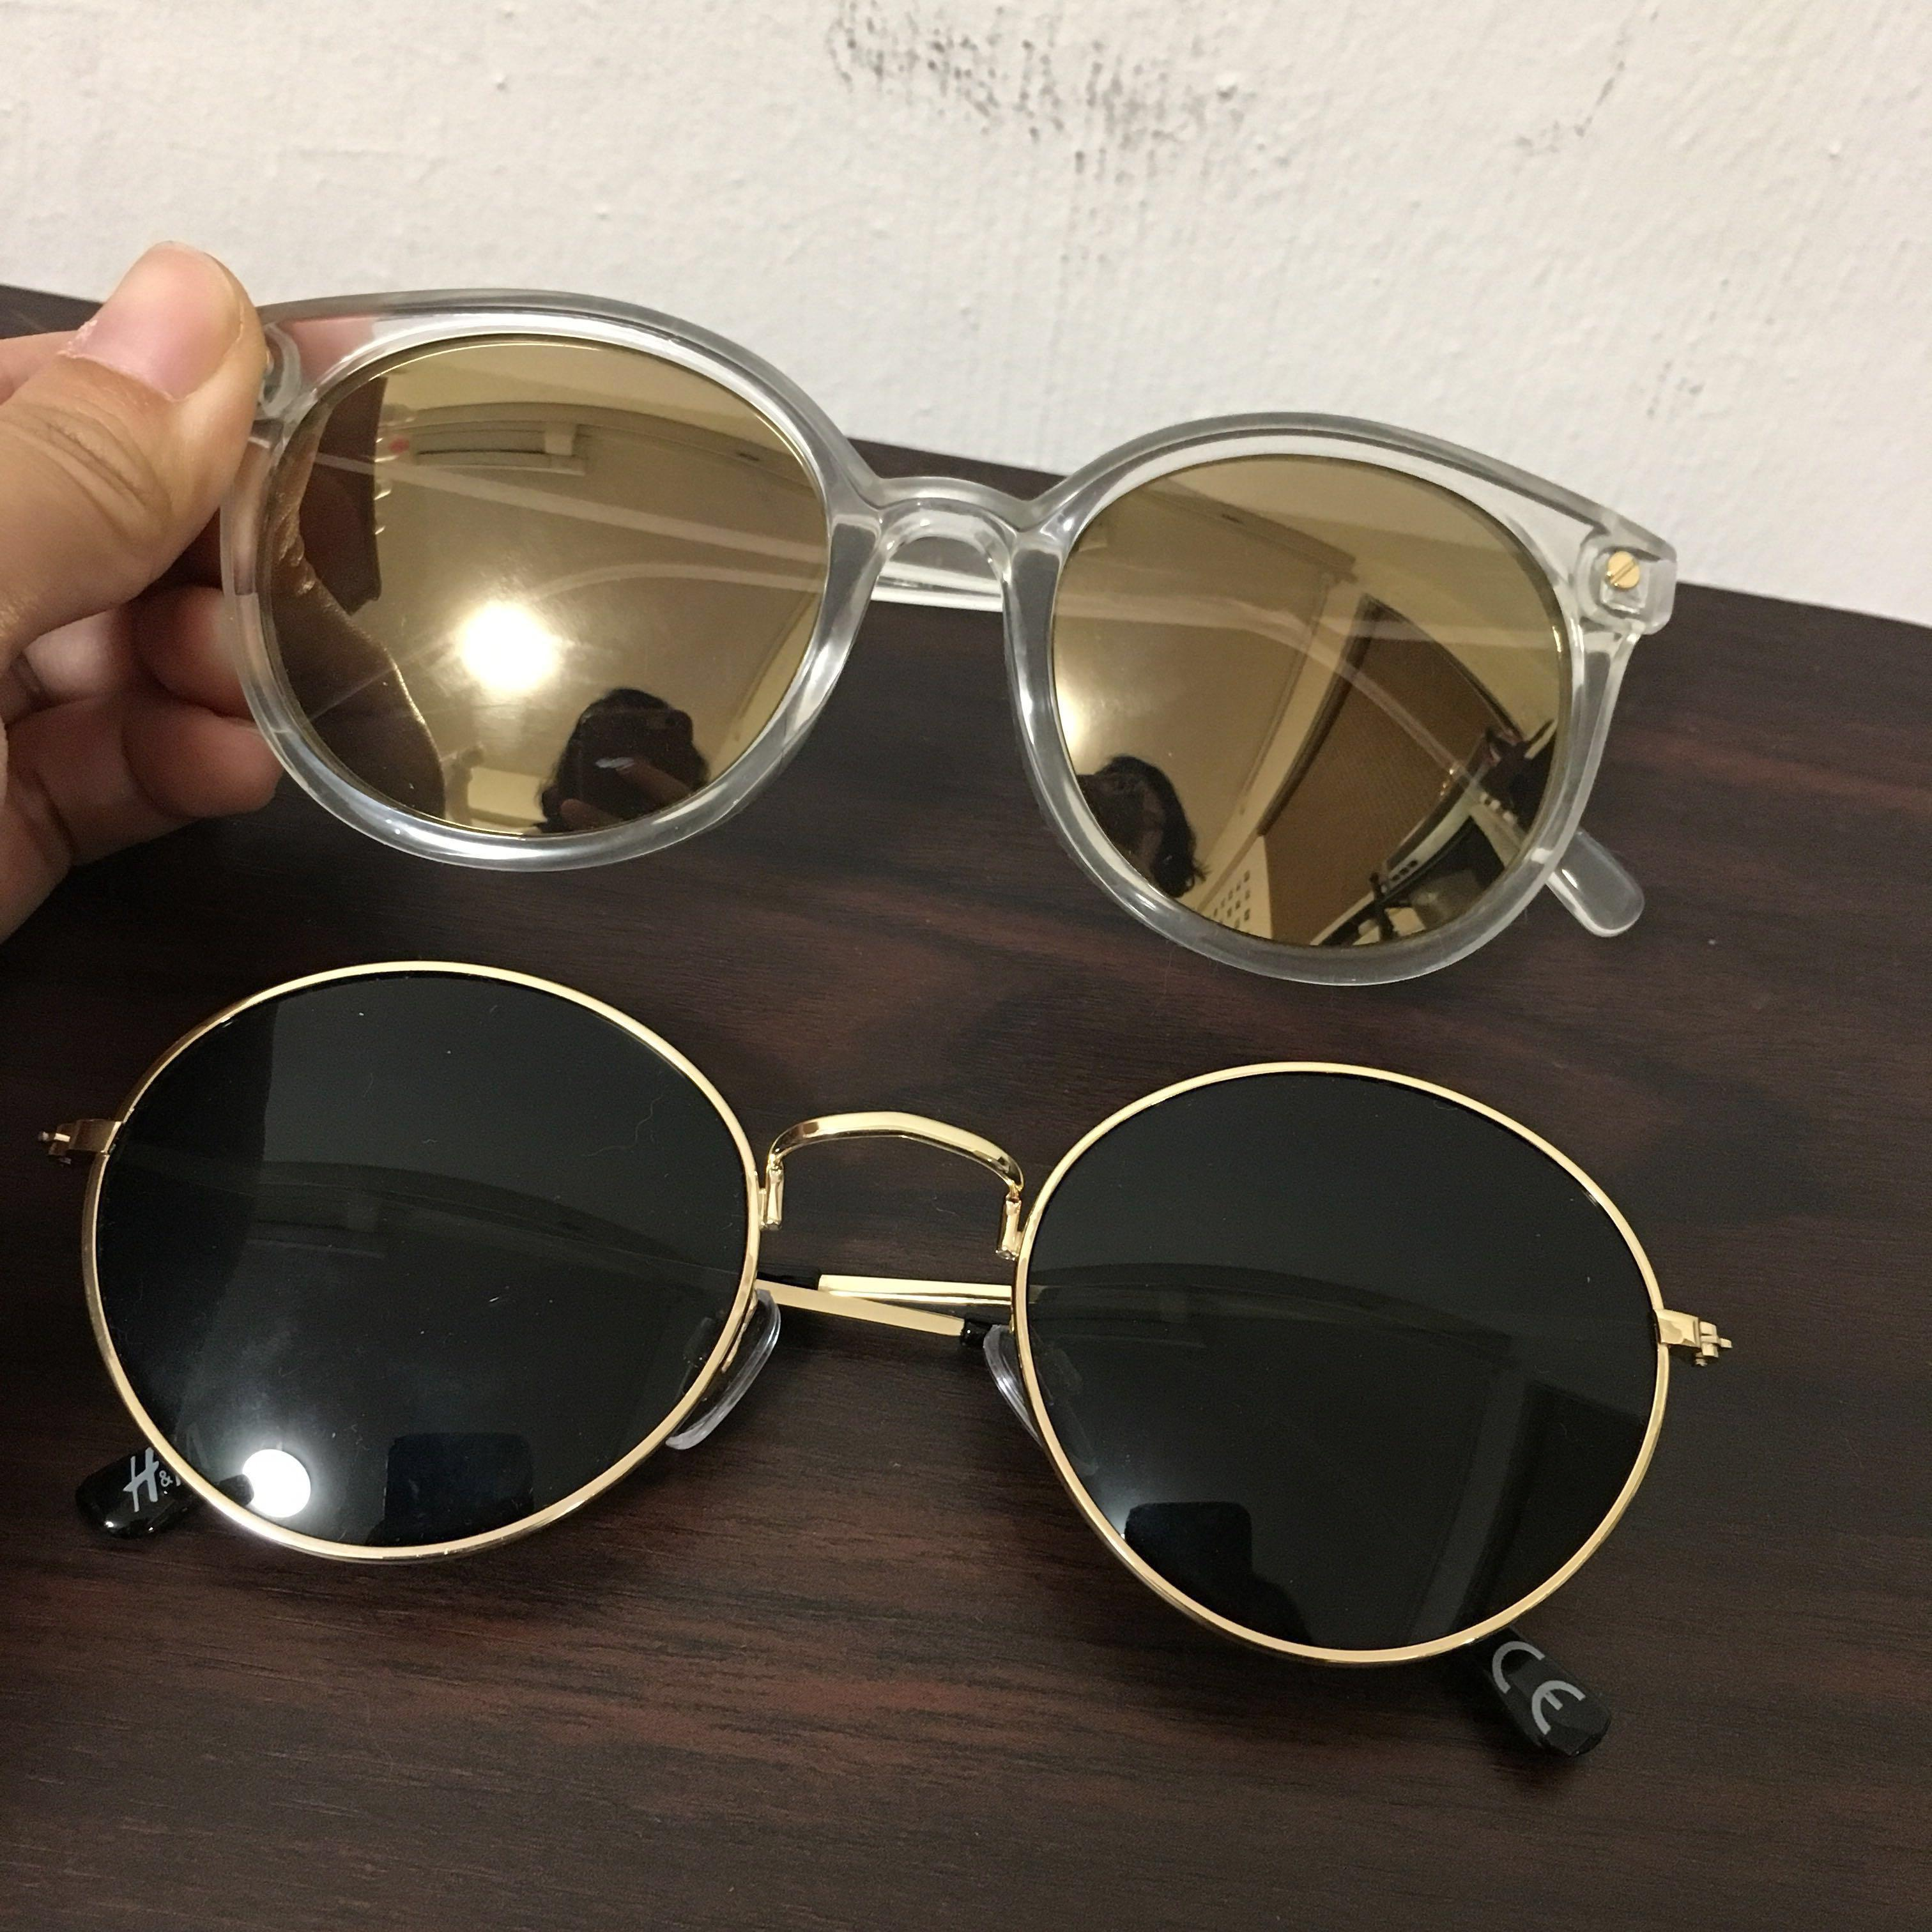 H SunglassesWomen's Brand New amp;m FashionAccessoriesEyewear YDIeWEH29